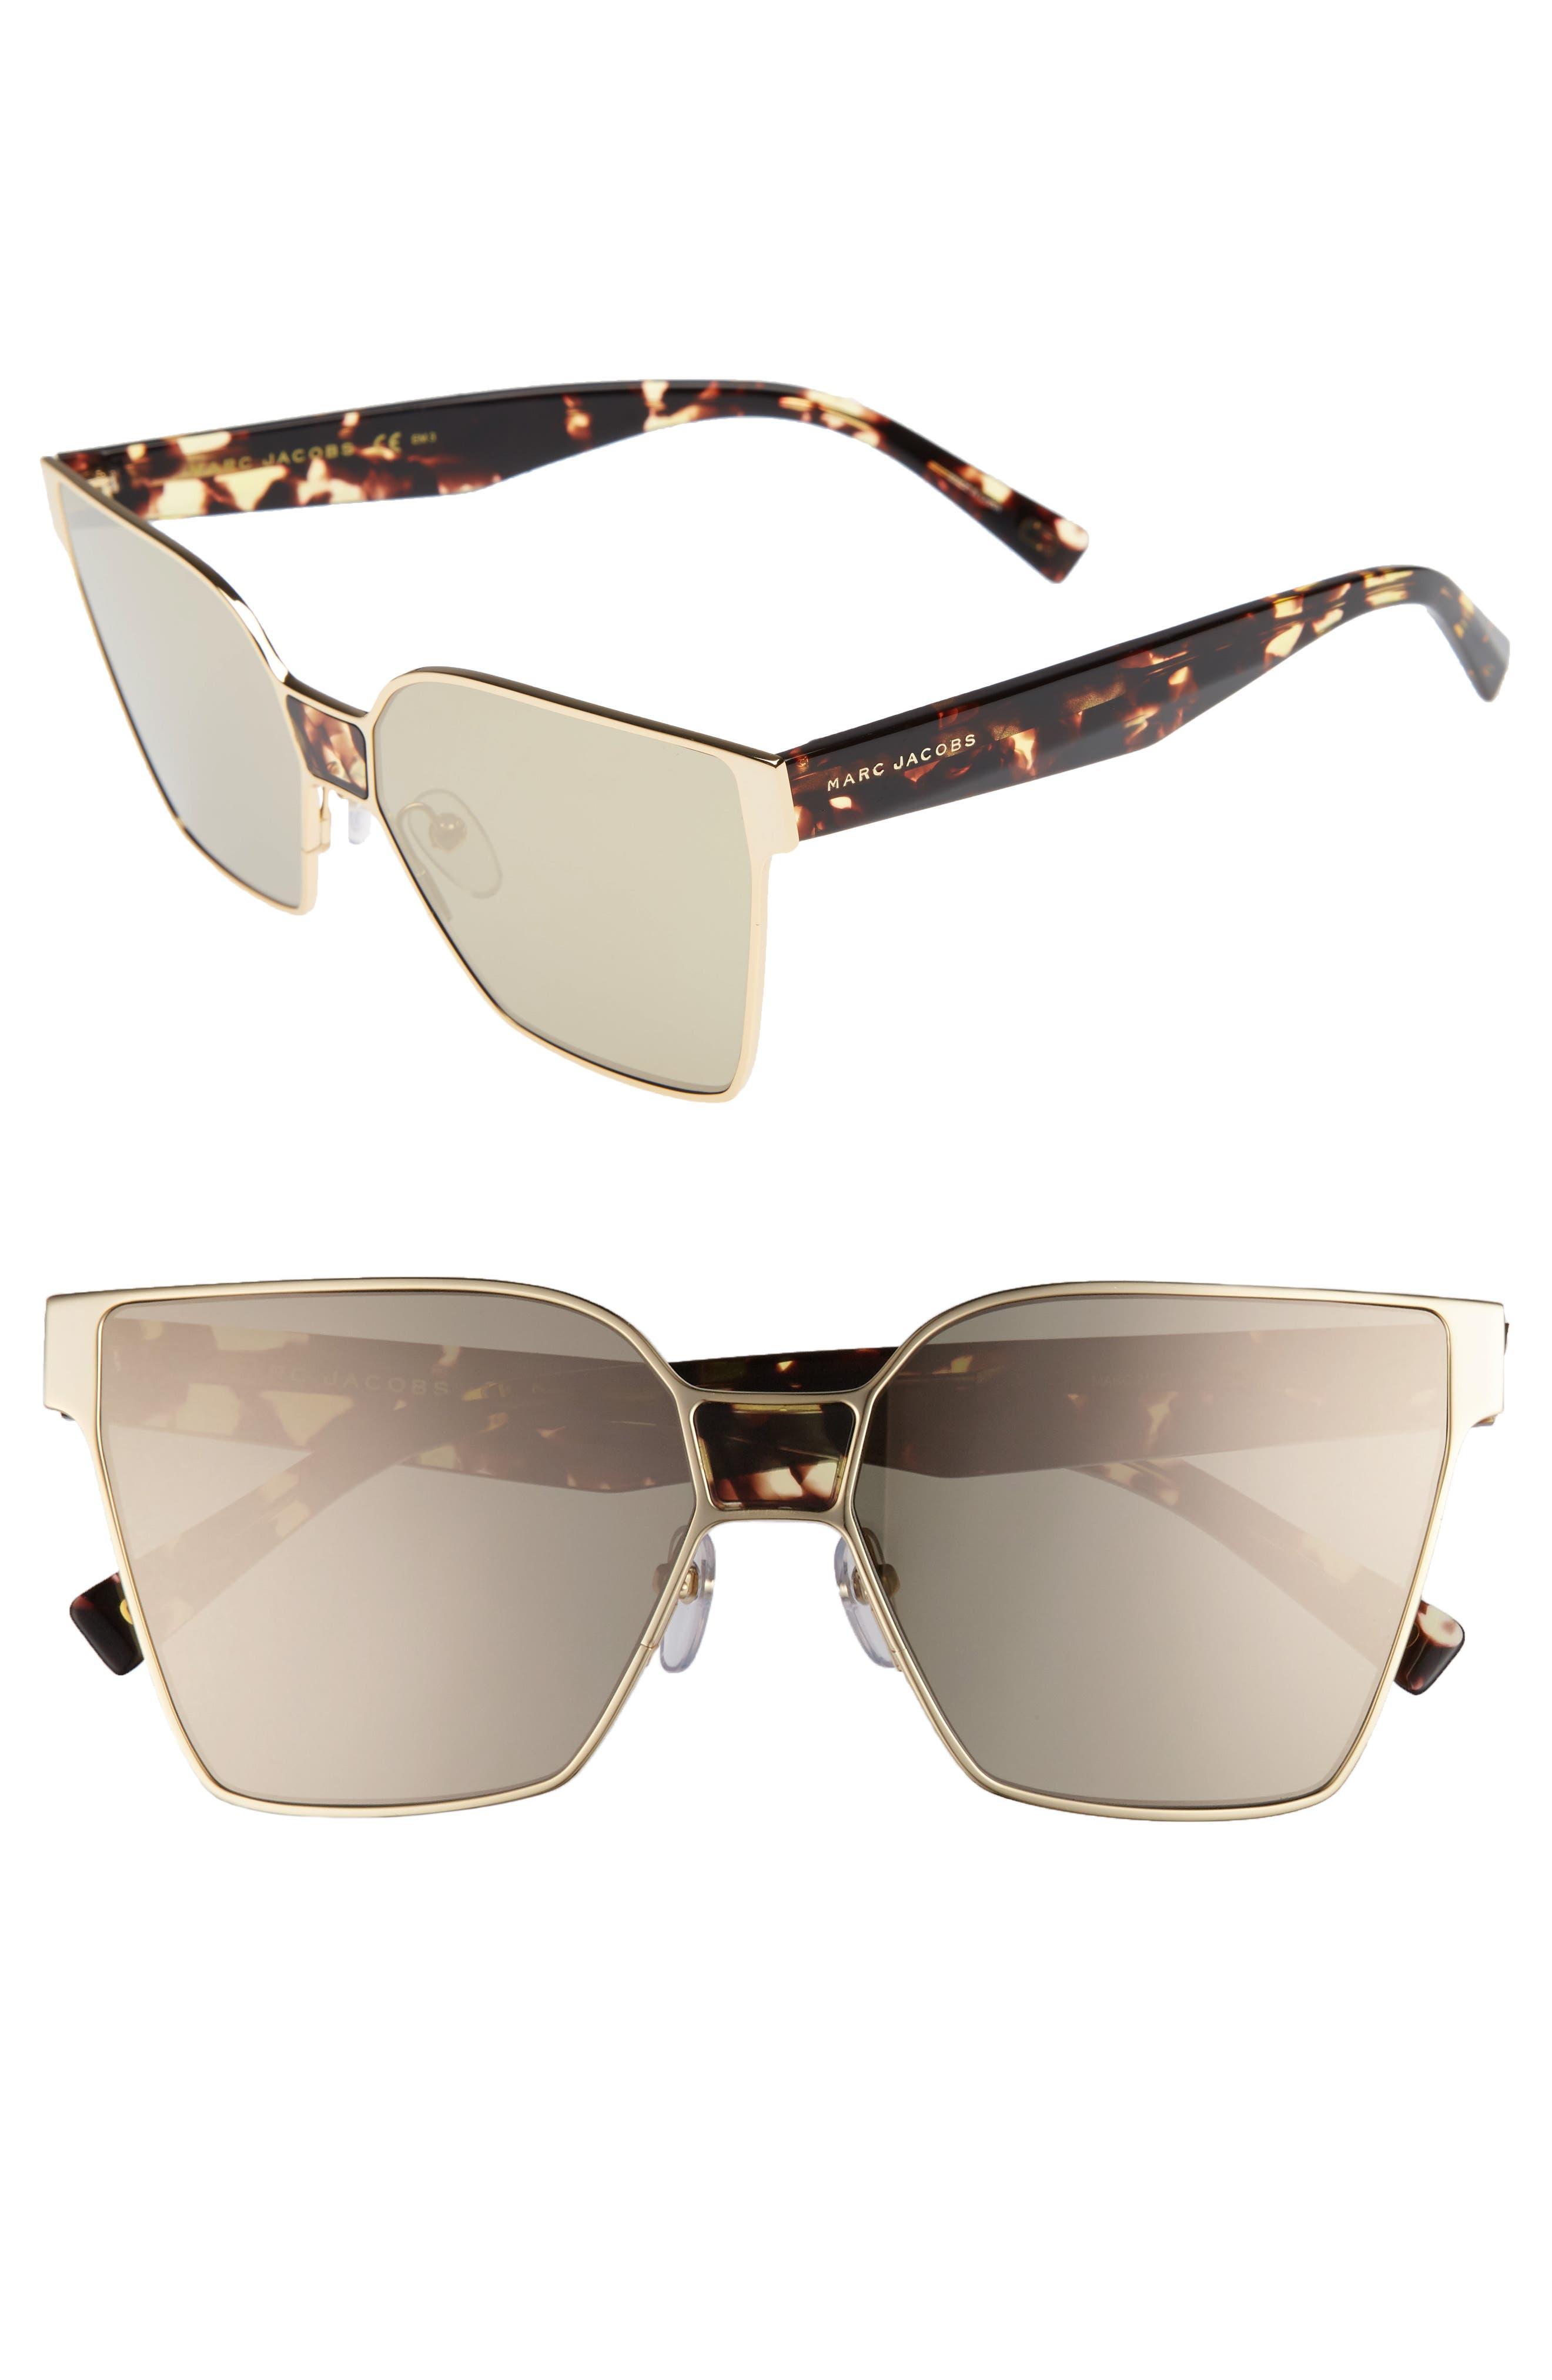 60mm Square Sunglasses,                             Main thumbnail 1, color,                             Gold